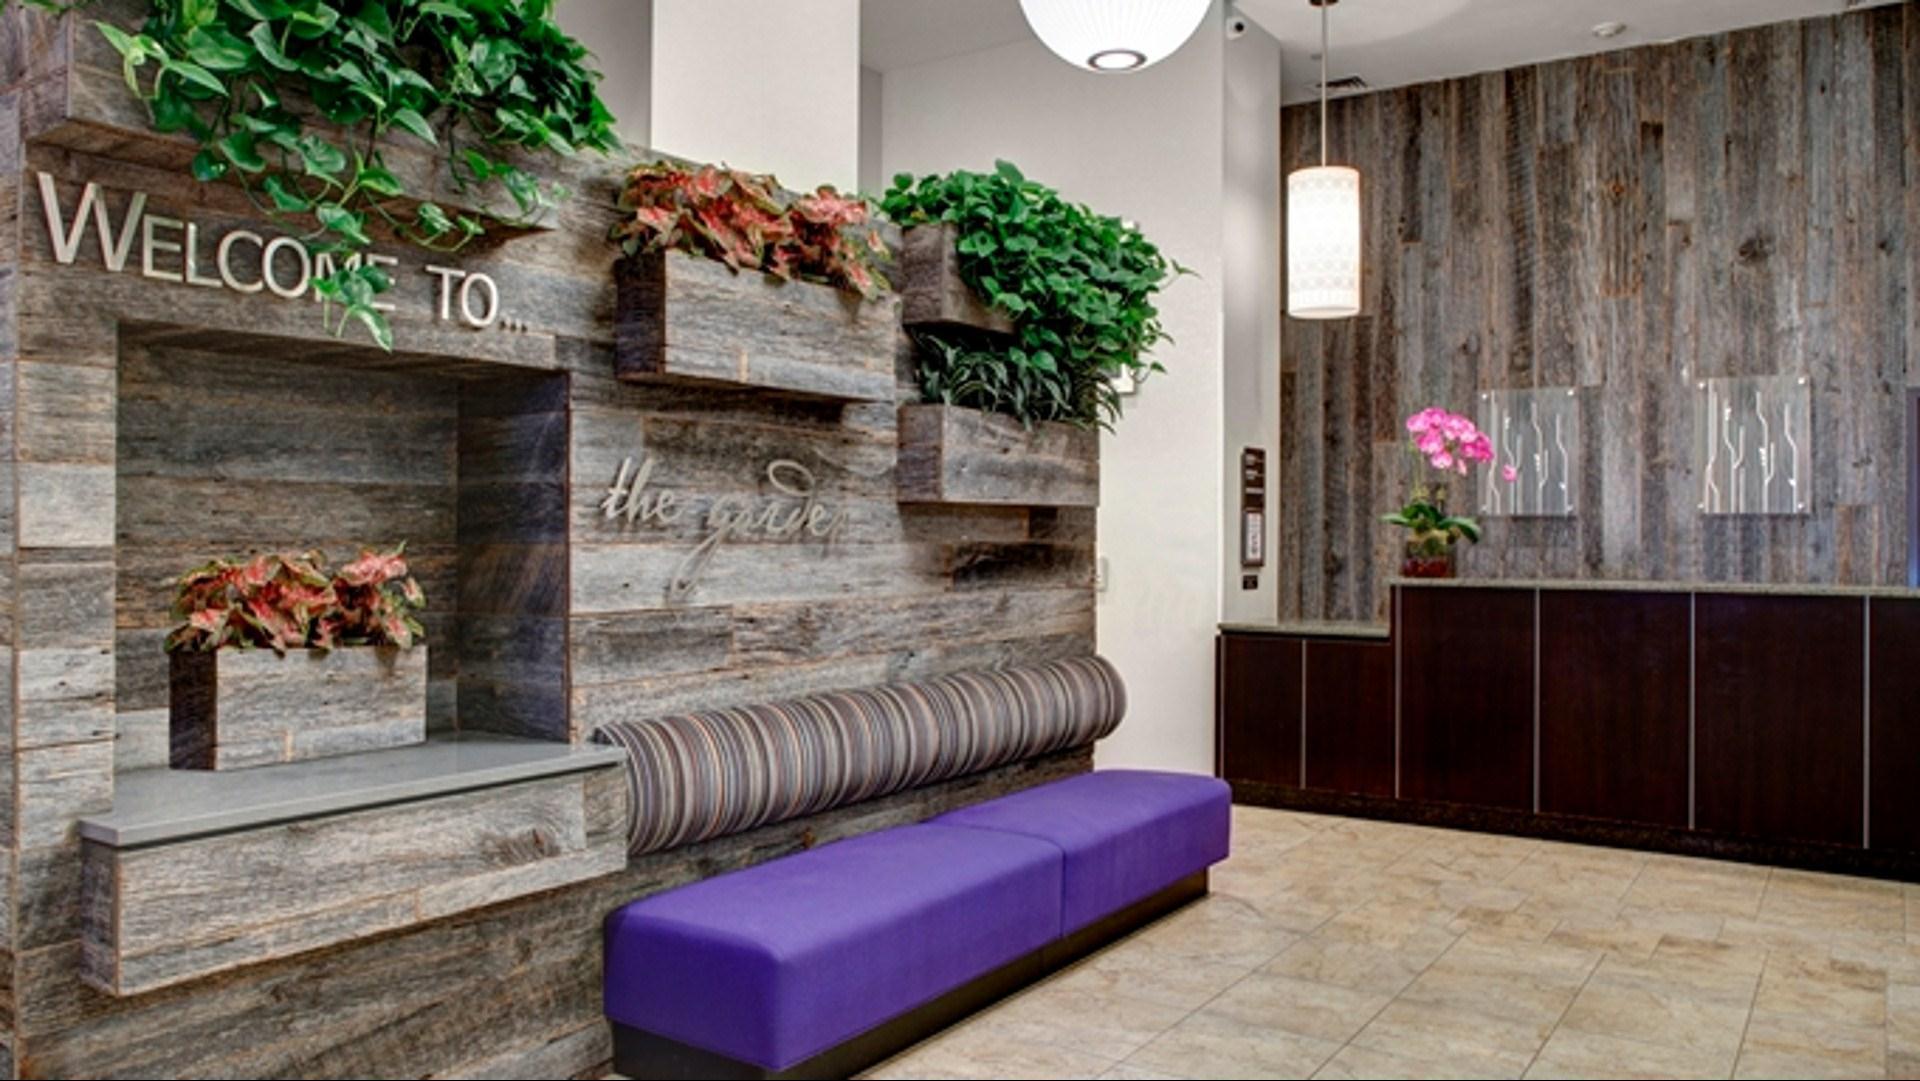 Meetings & Events at Hilton Garden Inn New York Manhattan Chelsea